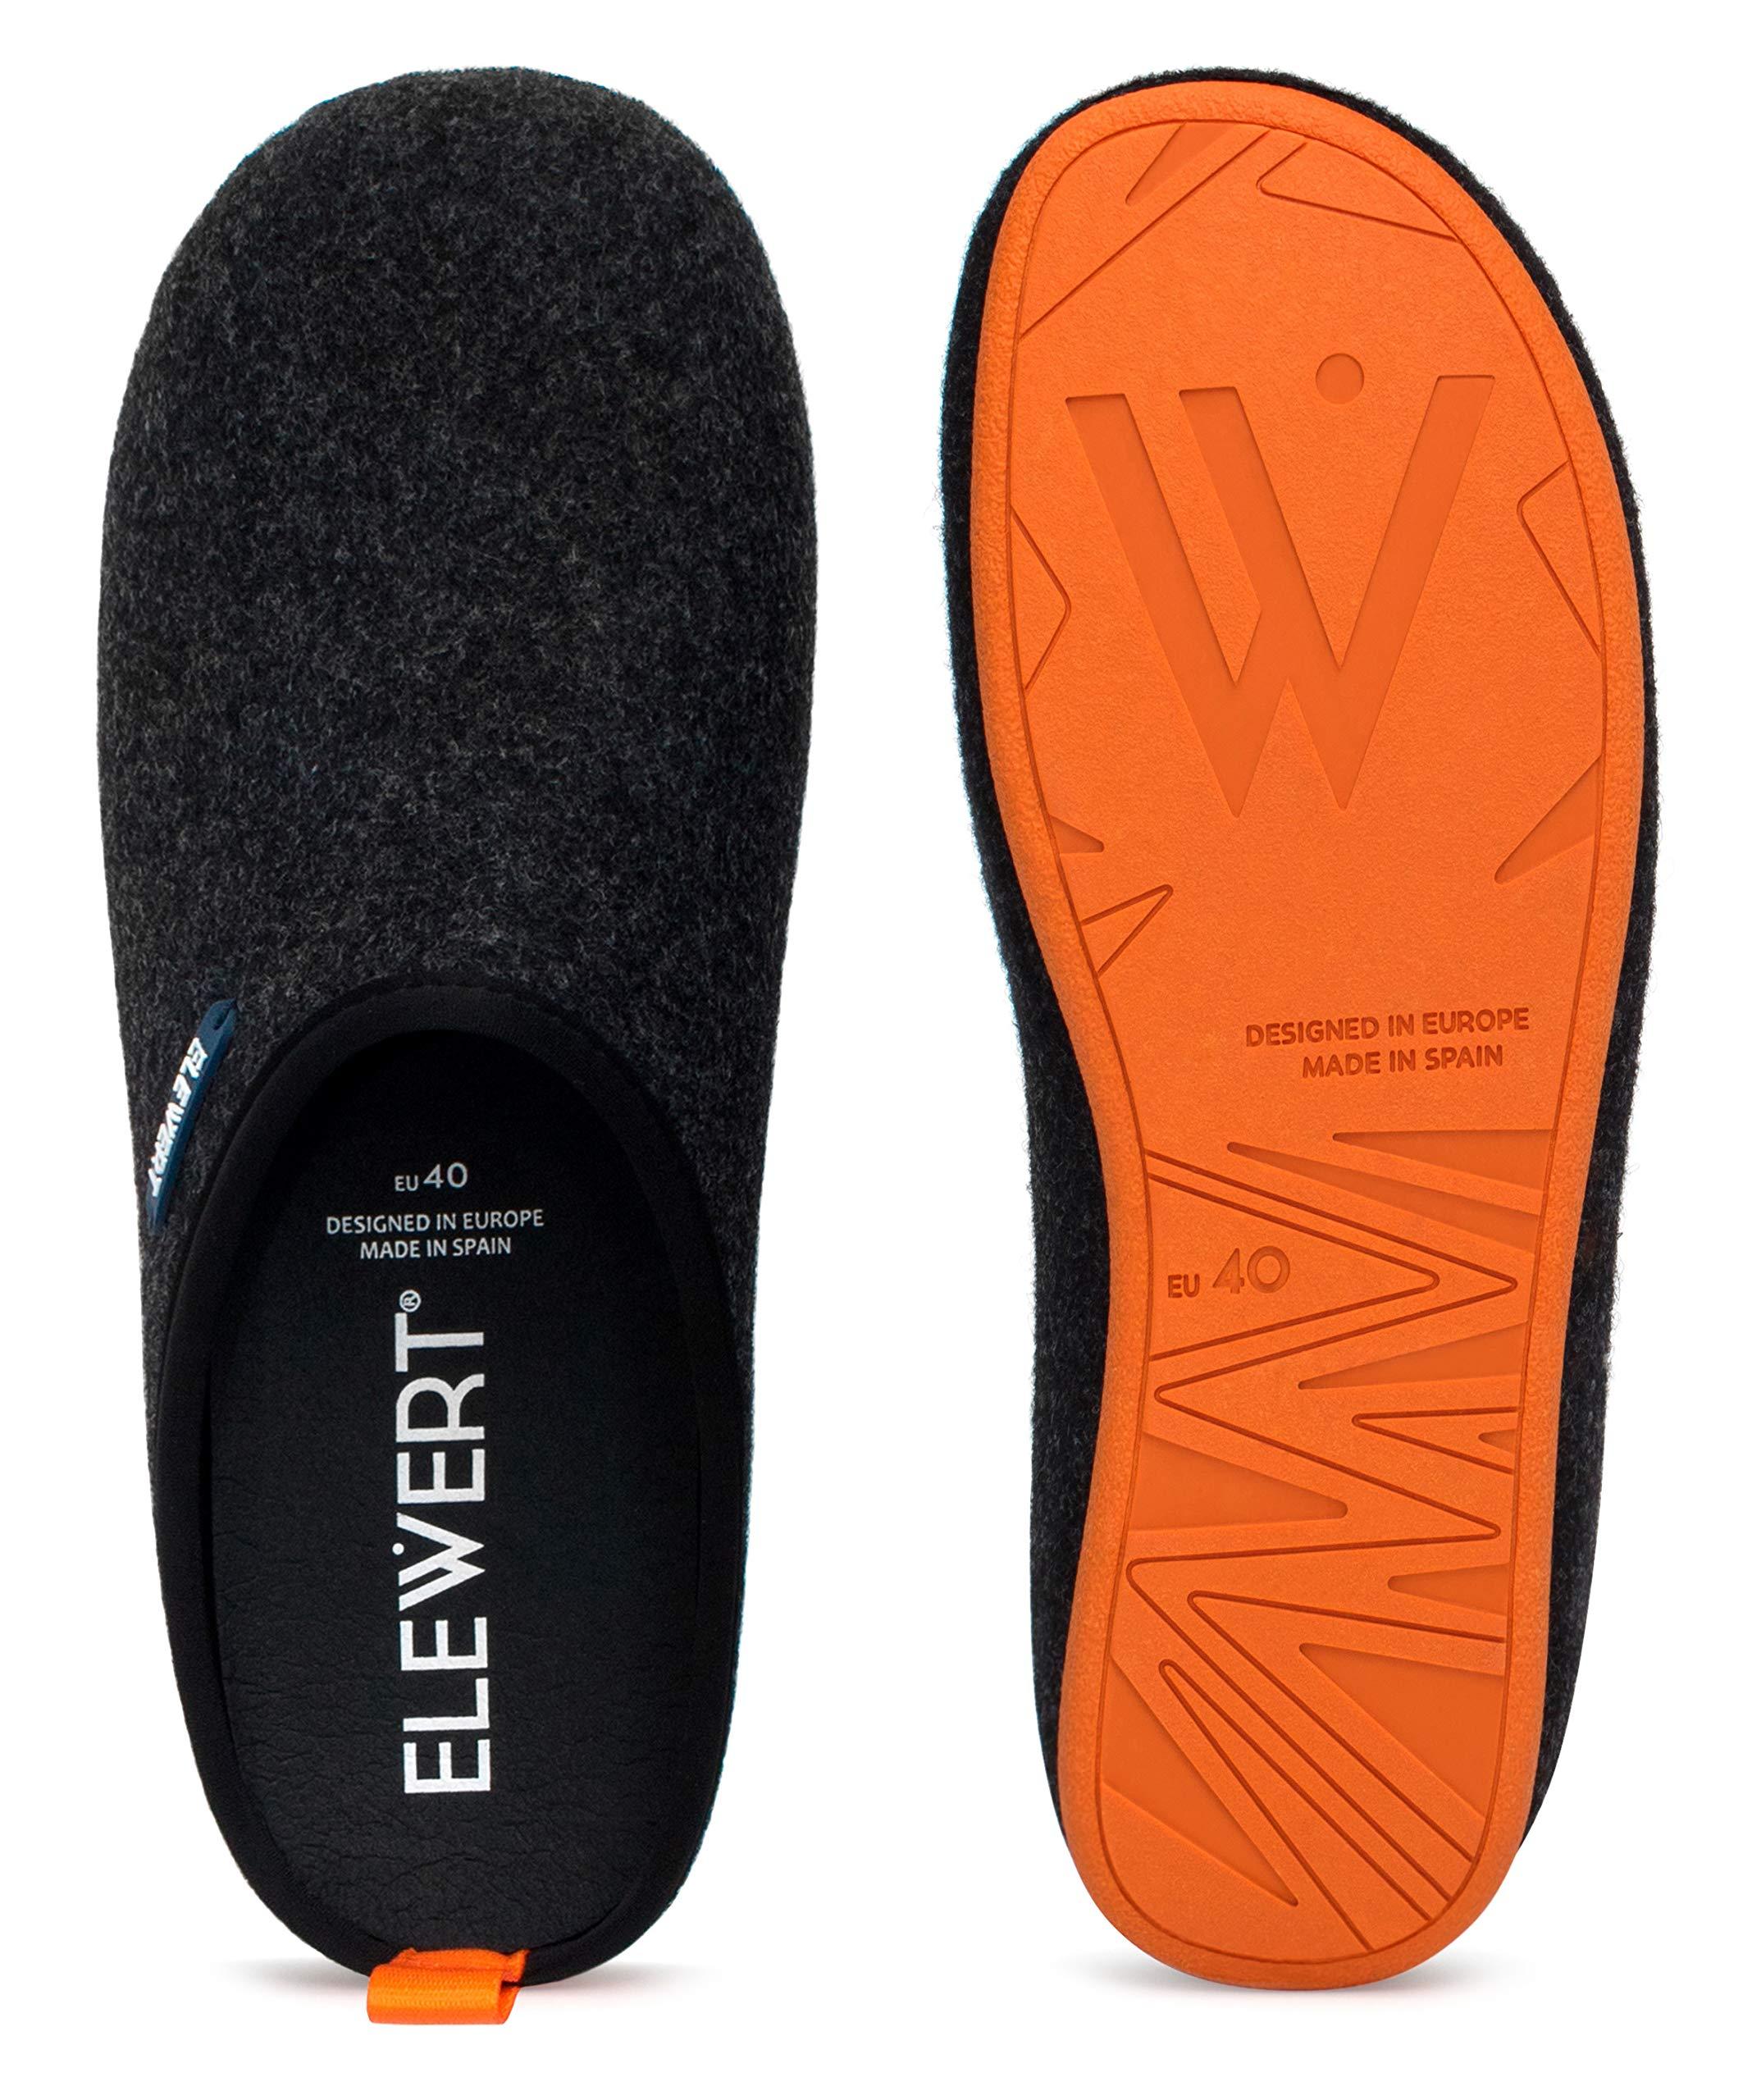 Mejor Zapatillas De Hombre Valorados Casa Estar En Umvqpsz Por XwZ8PONn0k